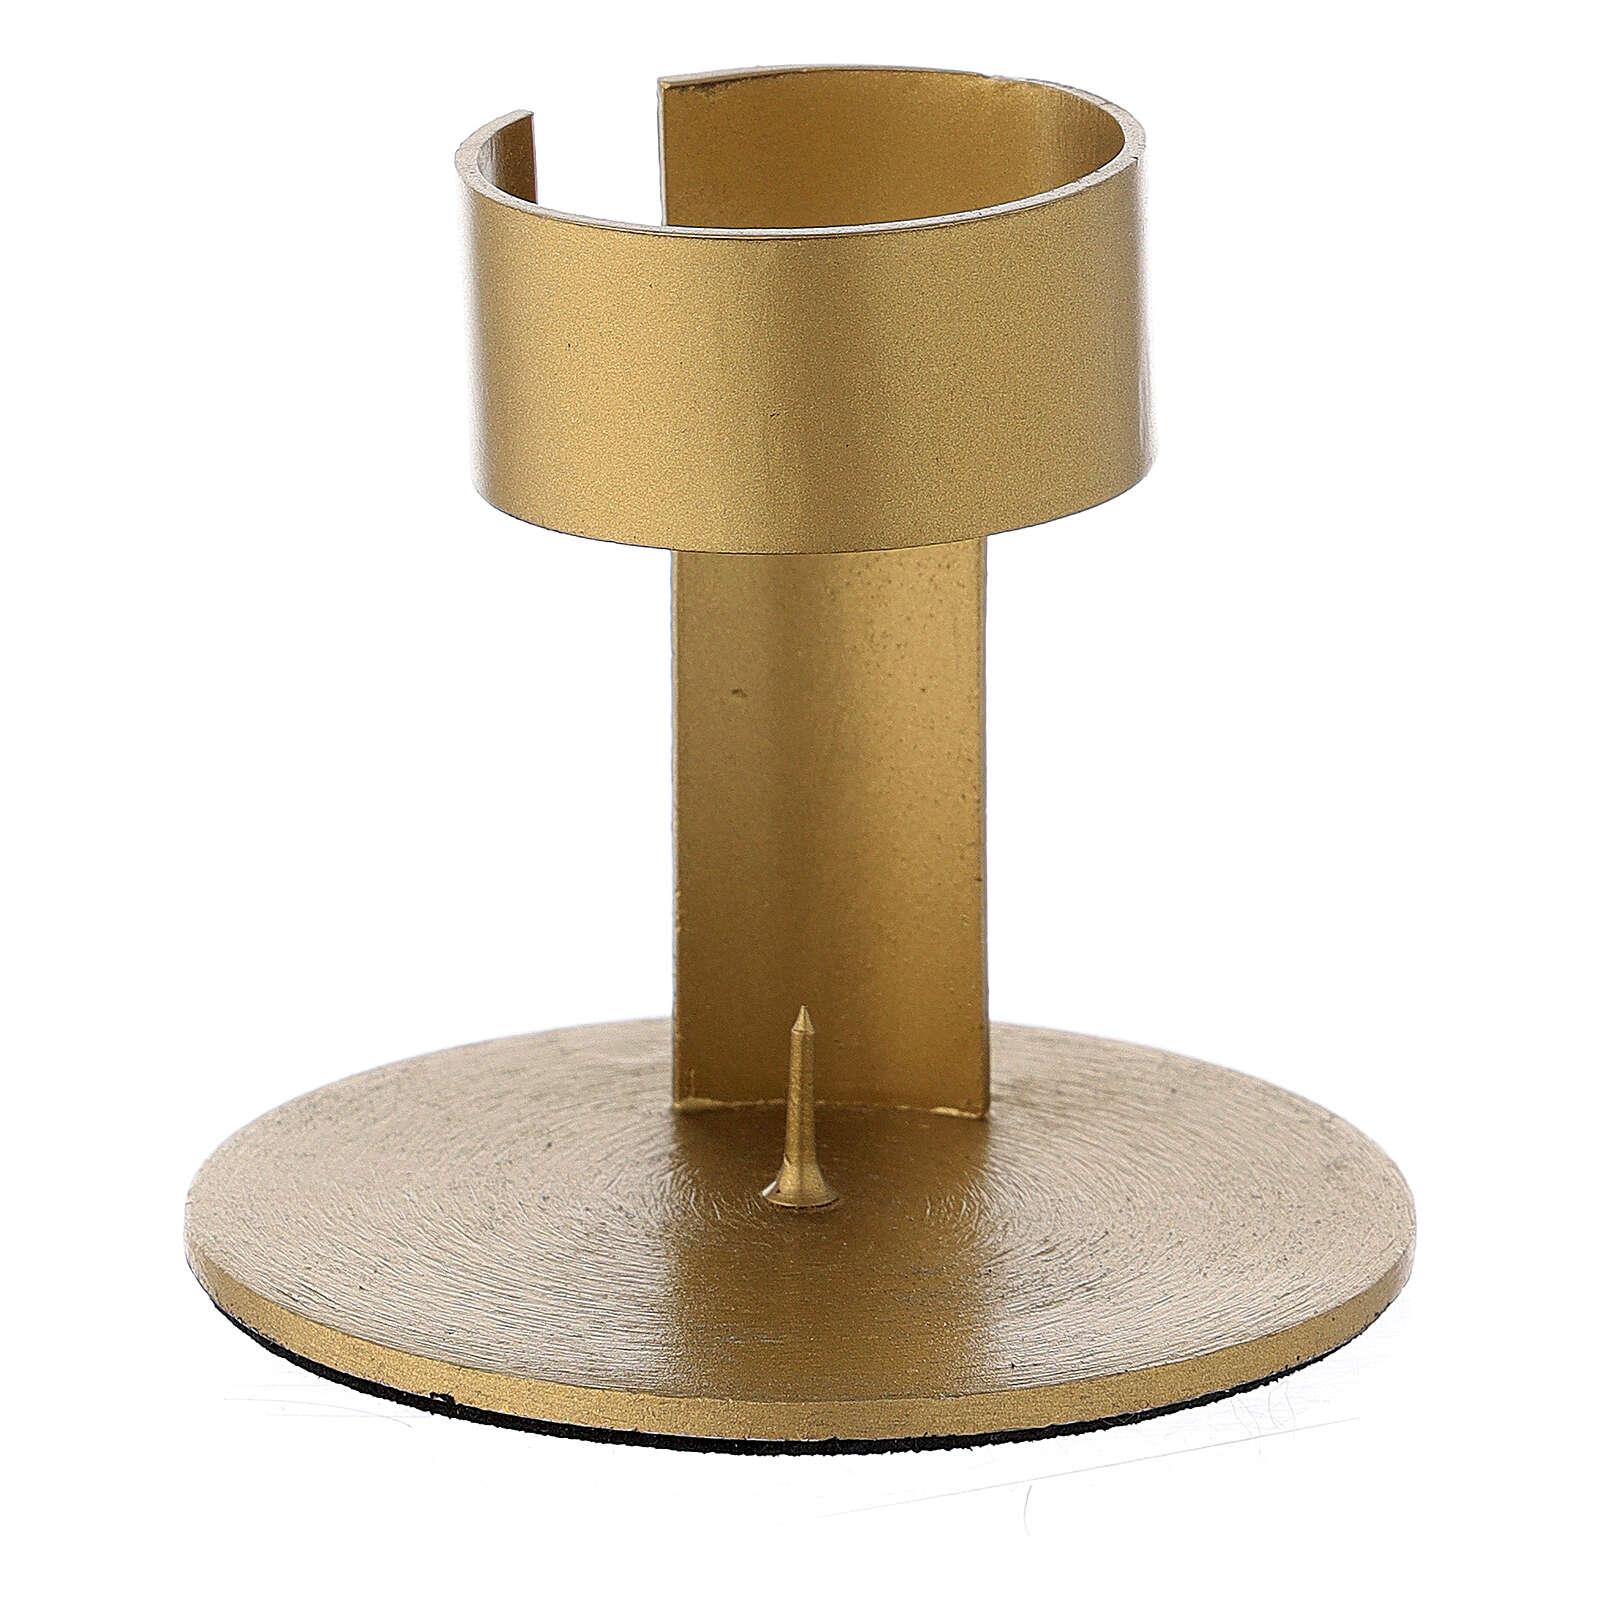 Portacandela alluminio dorato banda 4 cm 3